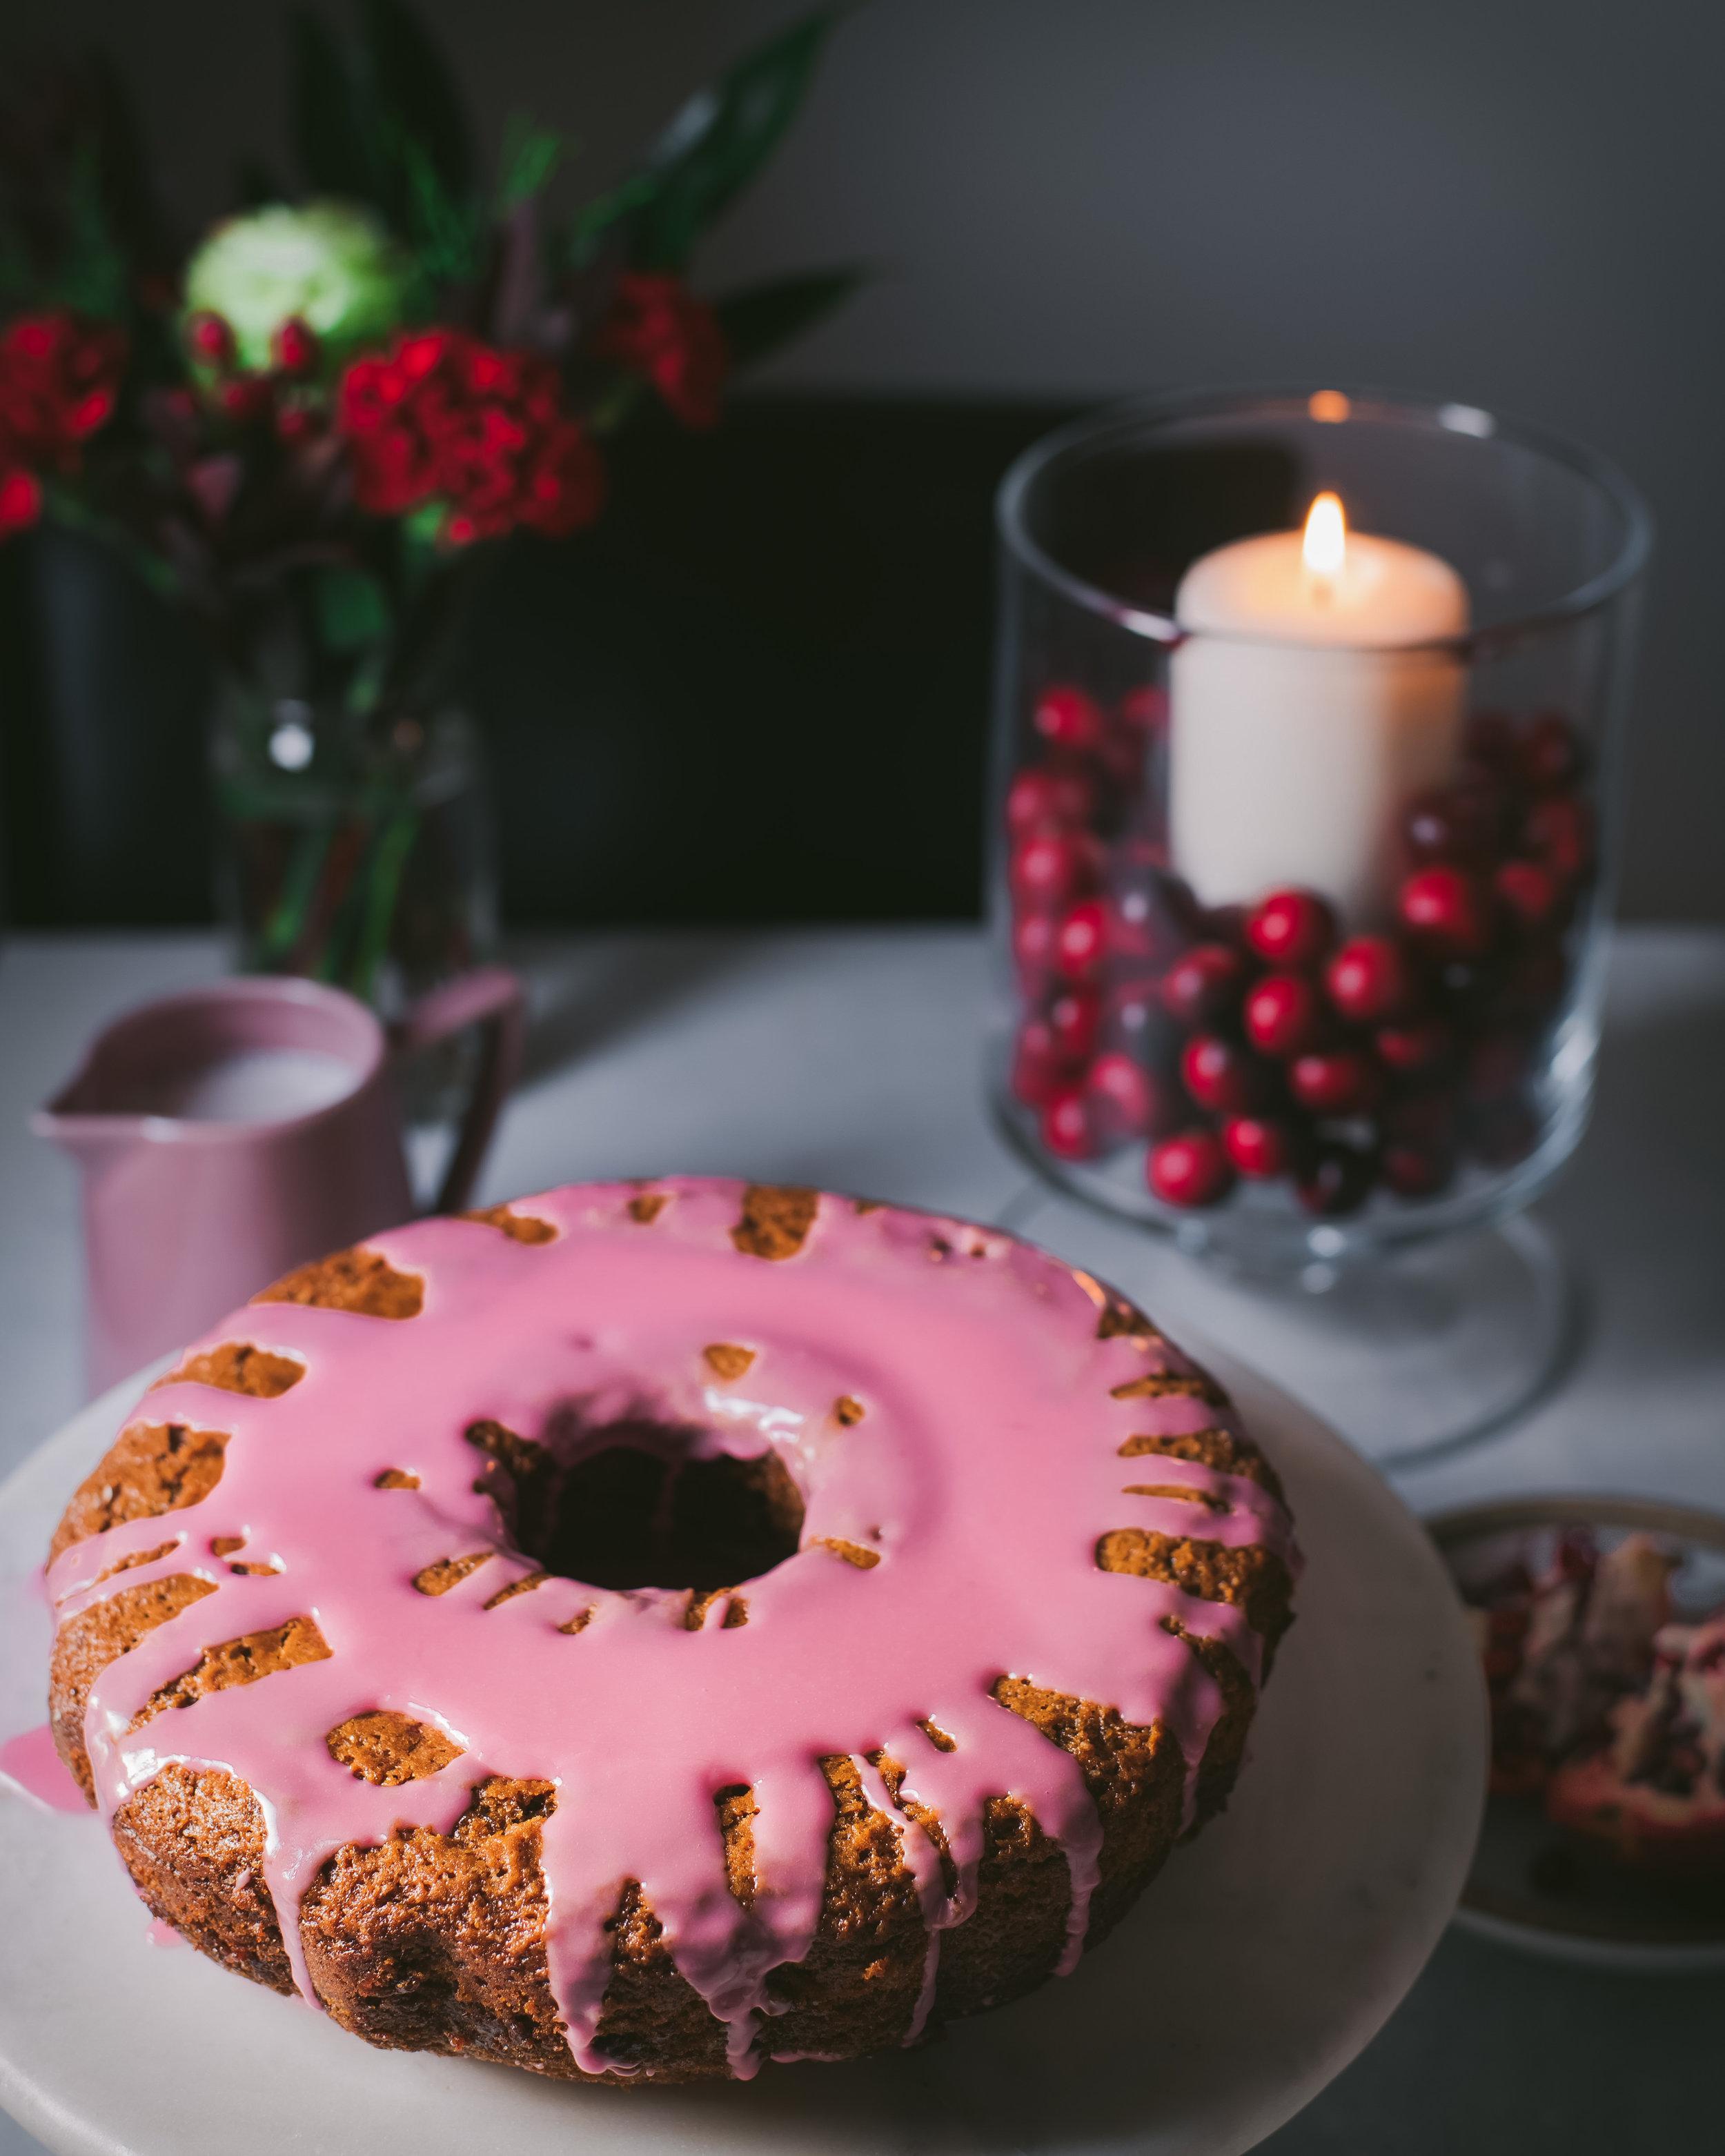 Pomegranate Glazed Gingerbread Bundt Cake